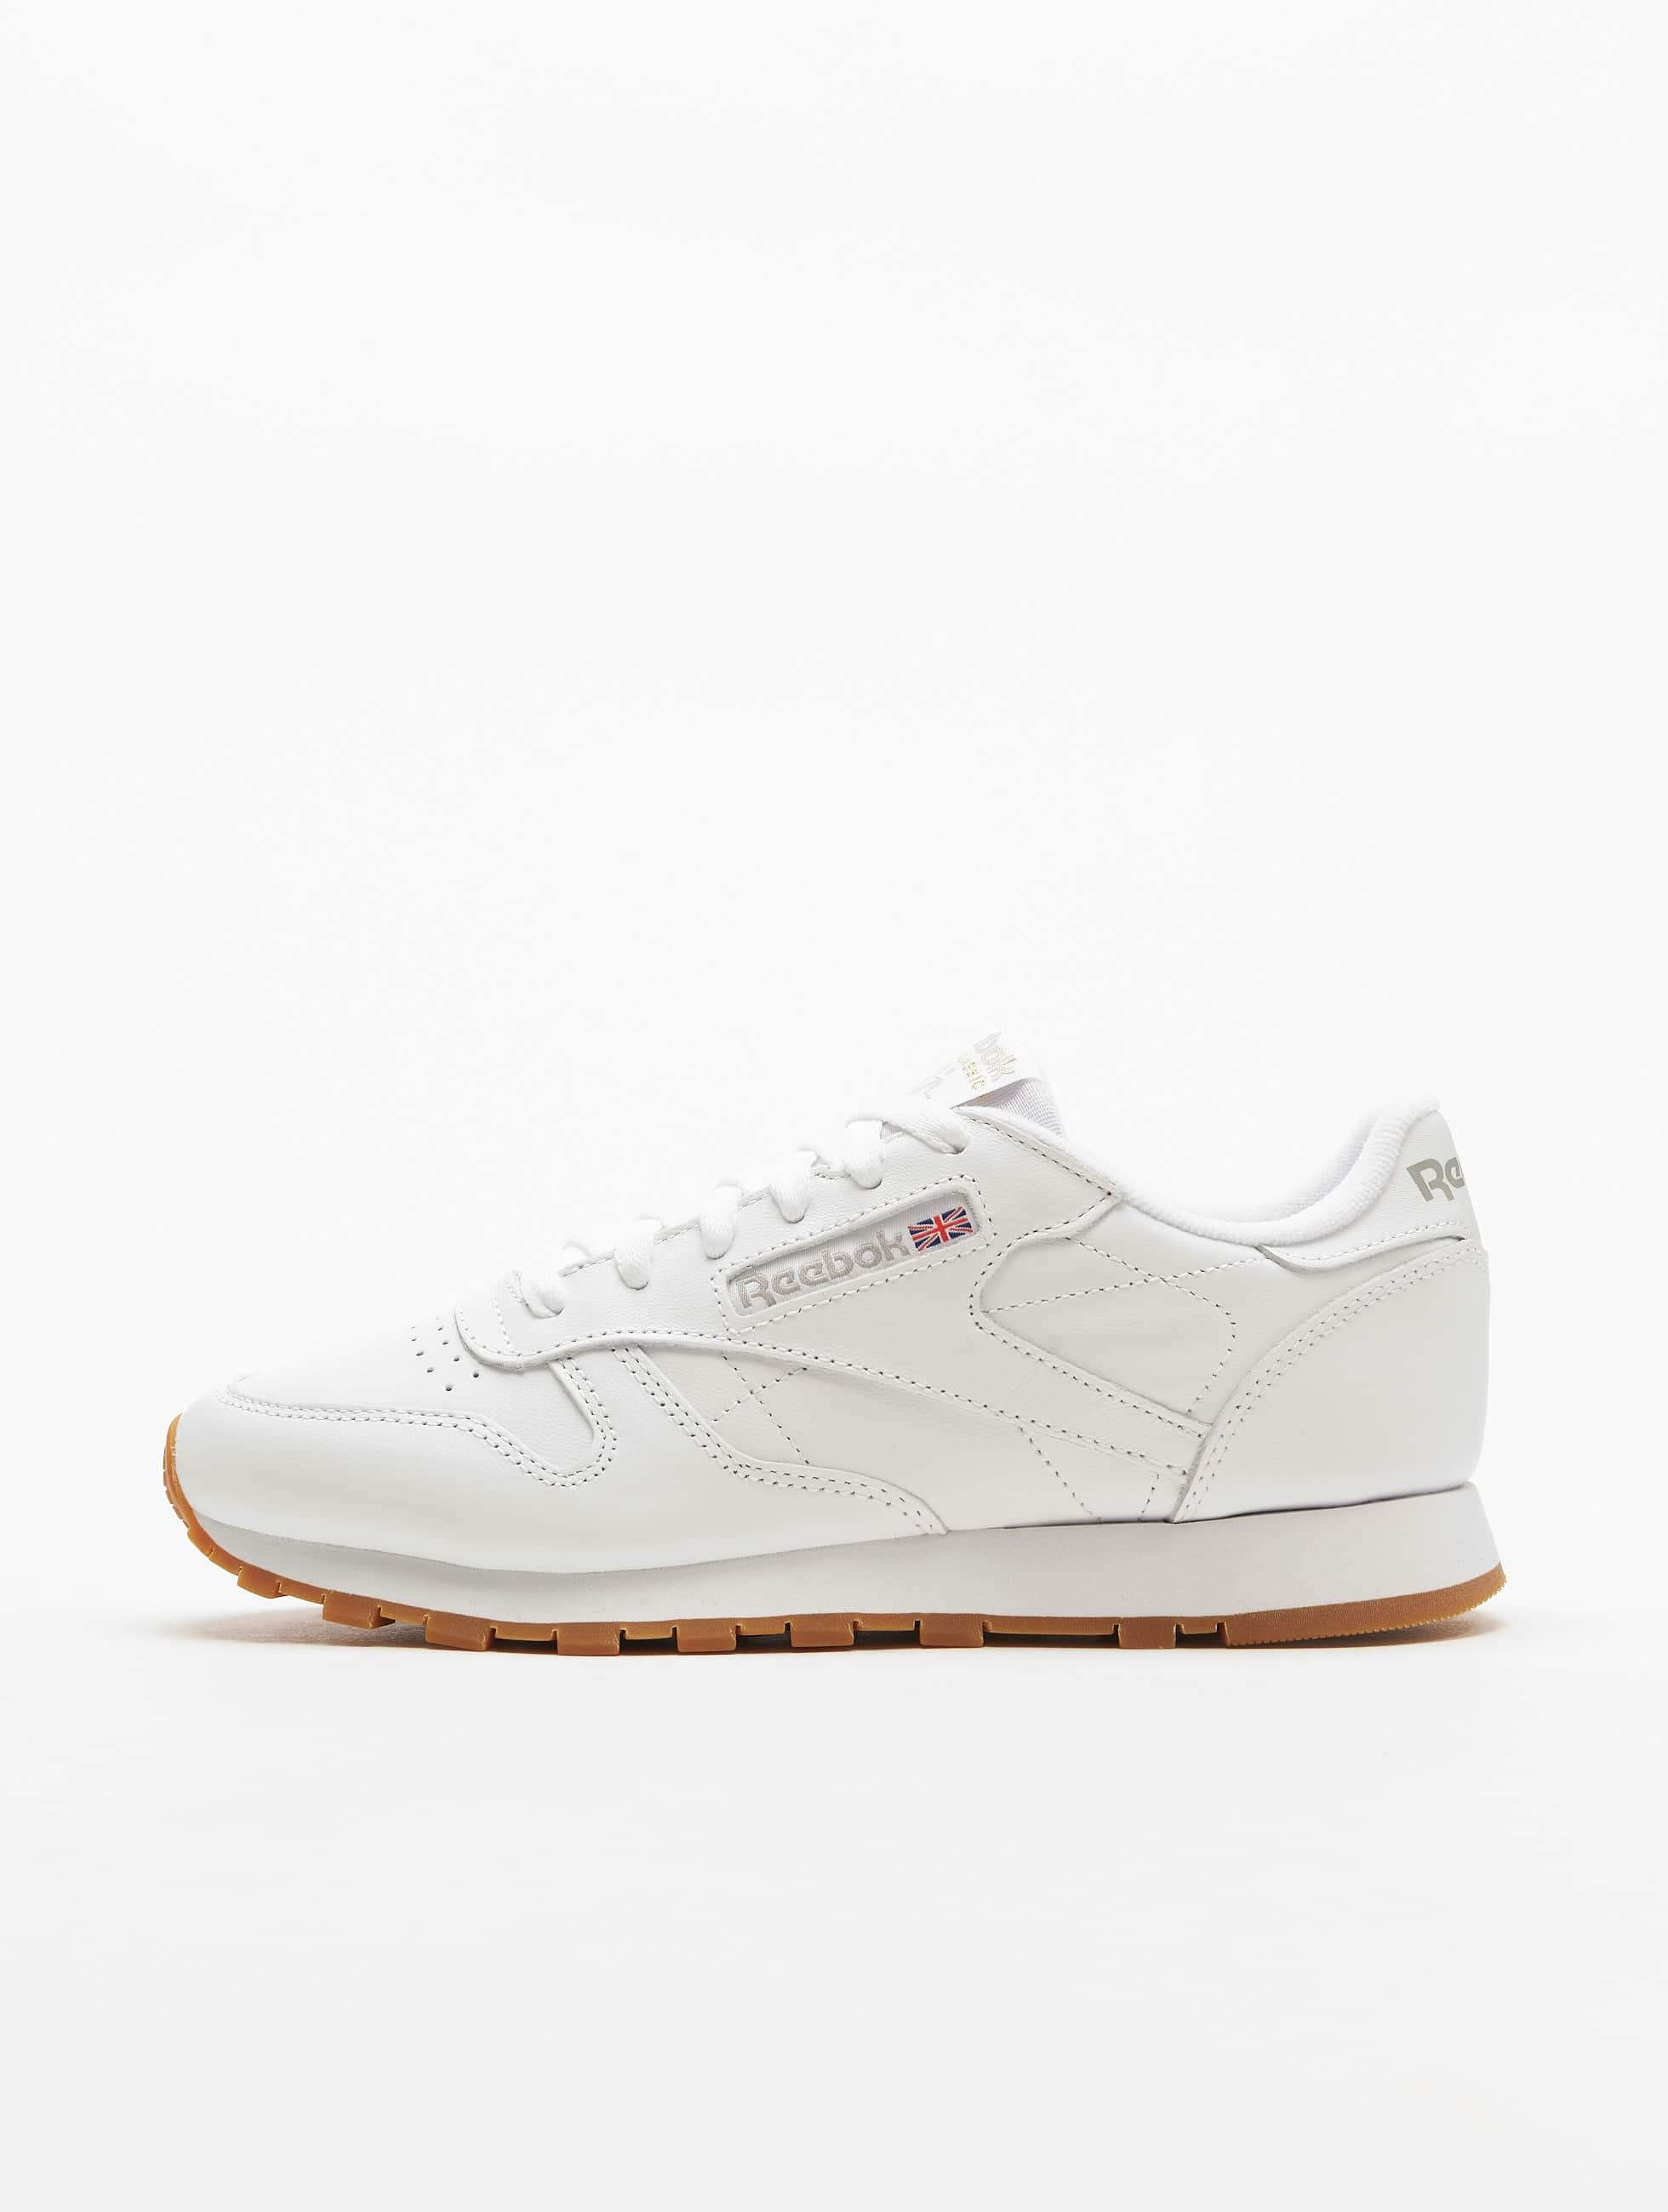 Reebok Classic Leather Sneakers WhiteGum